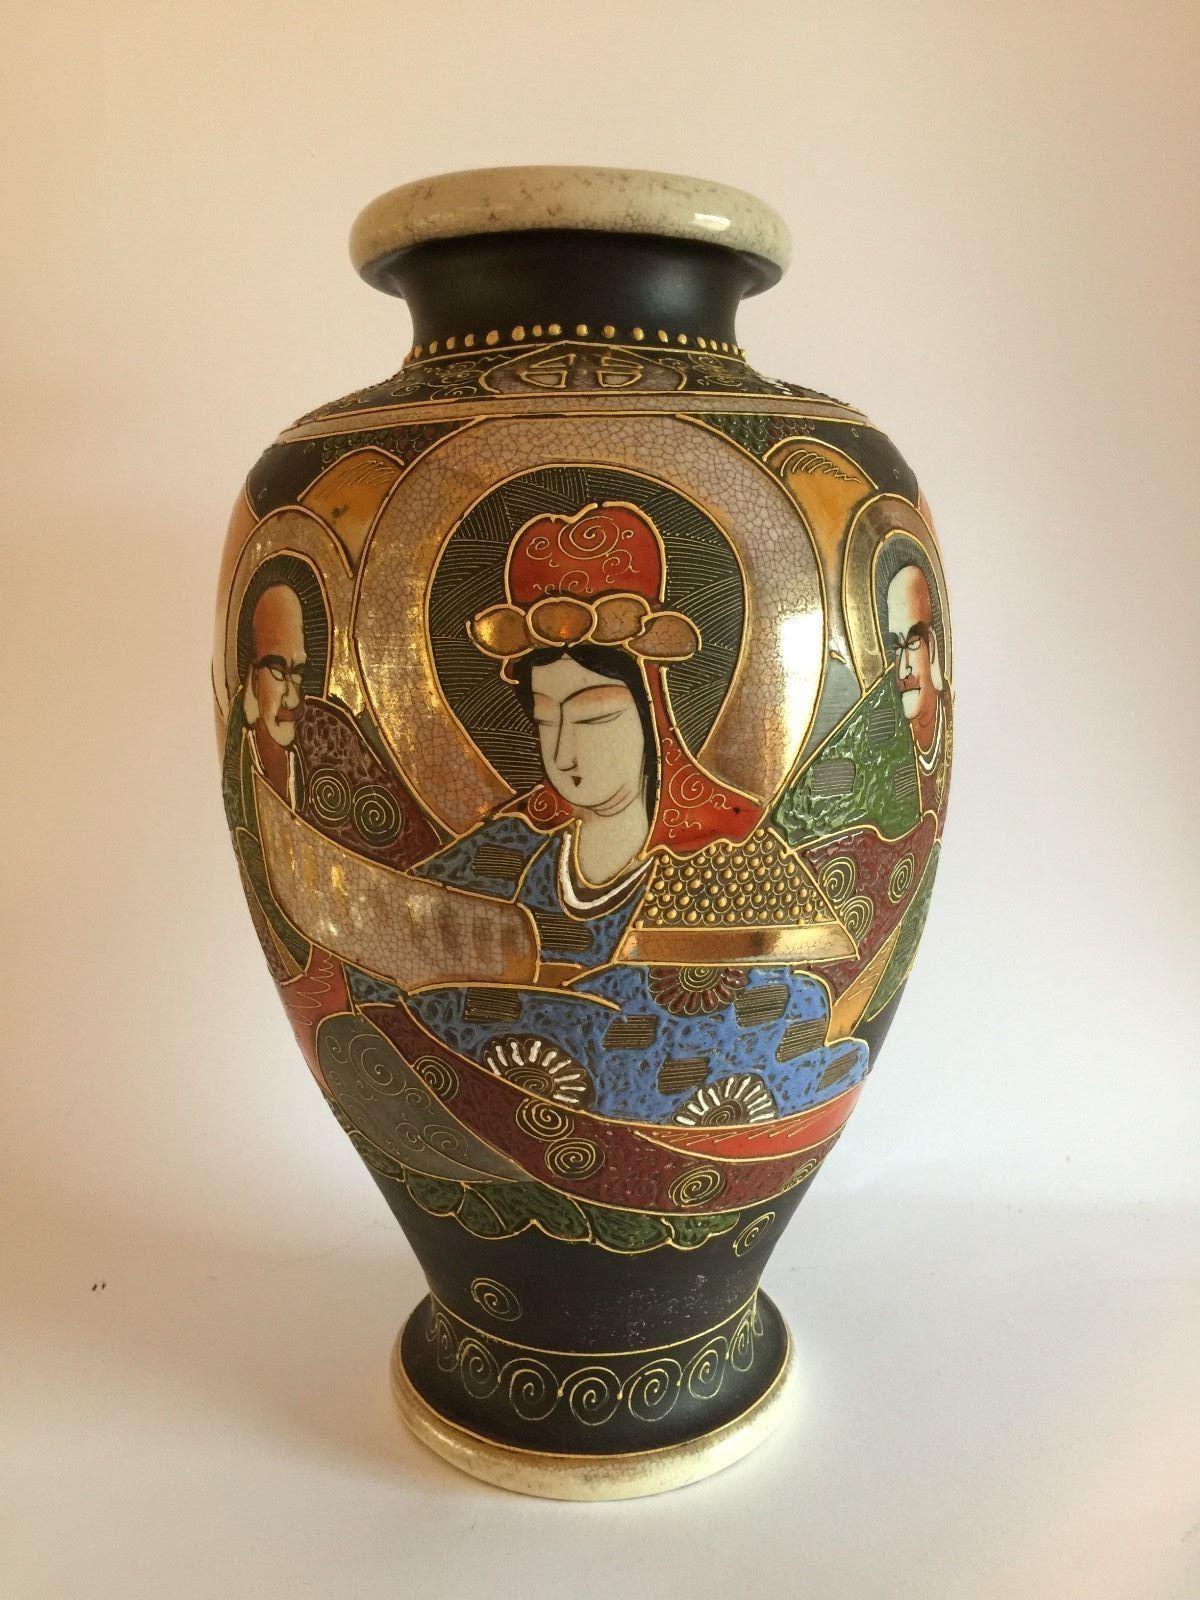 Satsuma vase porzellan japan handbemalt 32cm signiert ebay satsuma vase porzellan japan handbemalt 32cm signiert ebay reviewsmspy